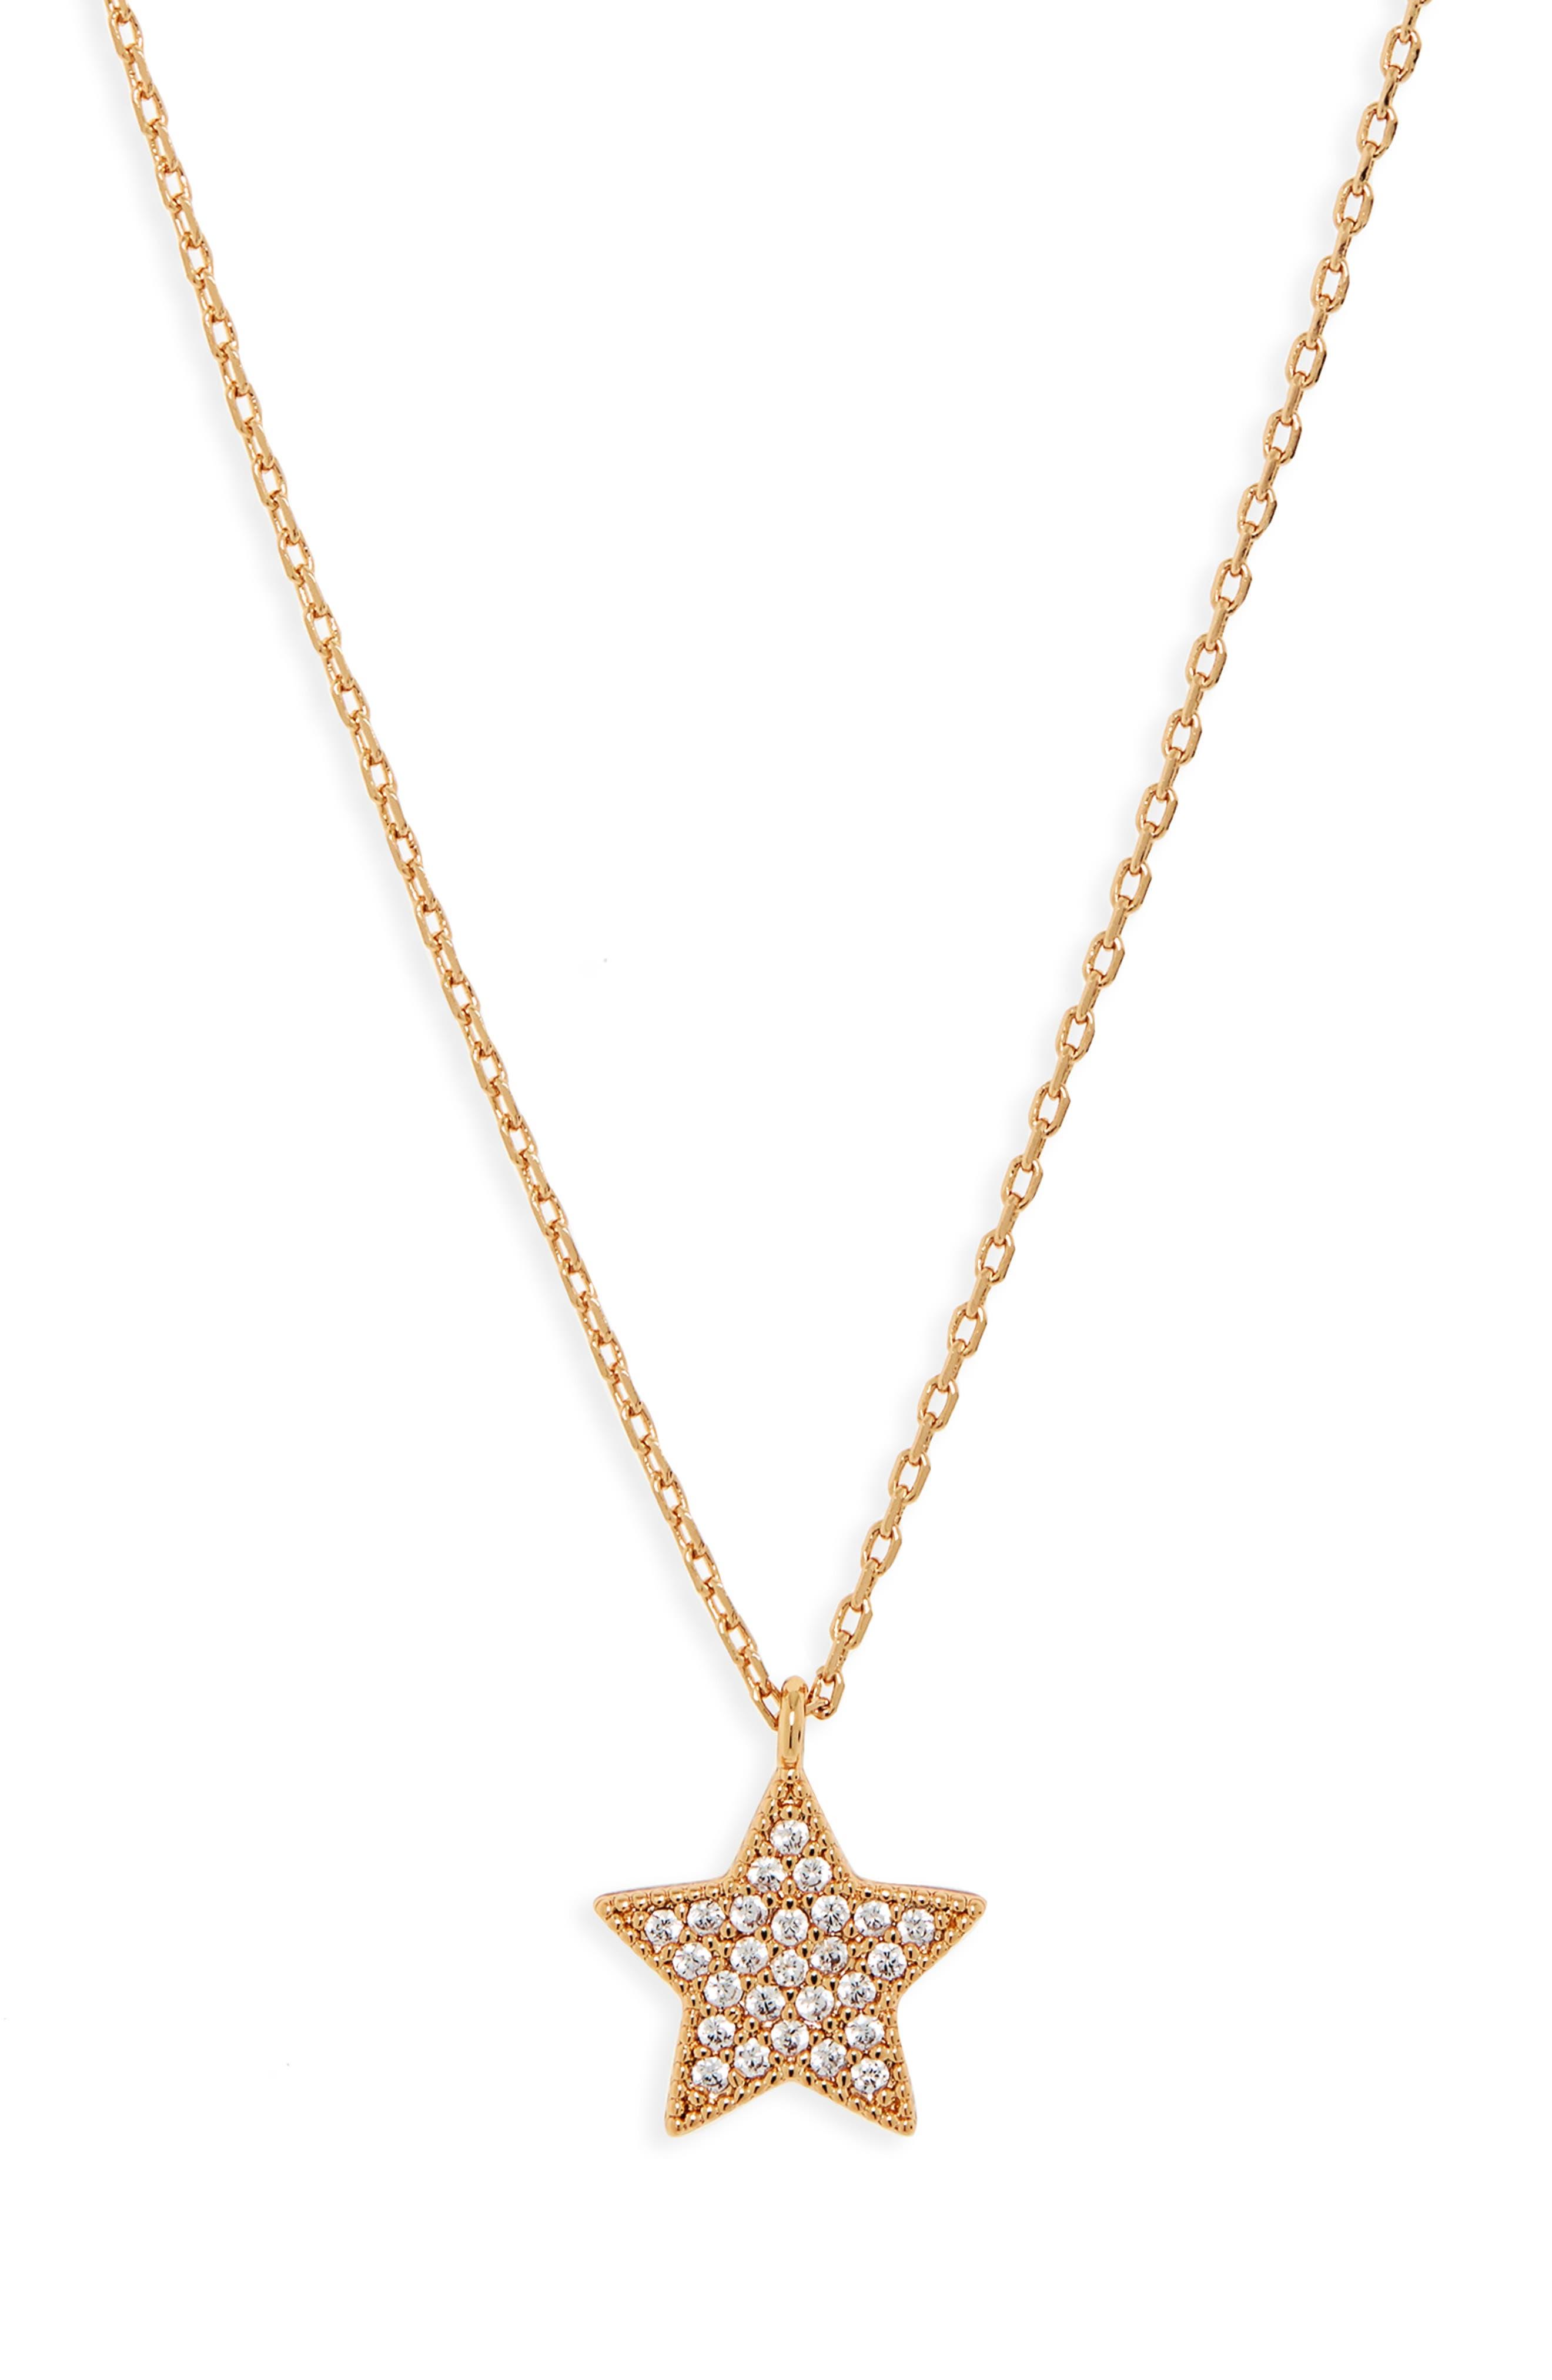 UNCOMMON JAMES BY KRISTIN CAVALLARI, Big Star Pendant Necklace, Main thumbnail 1, color, GOLD